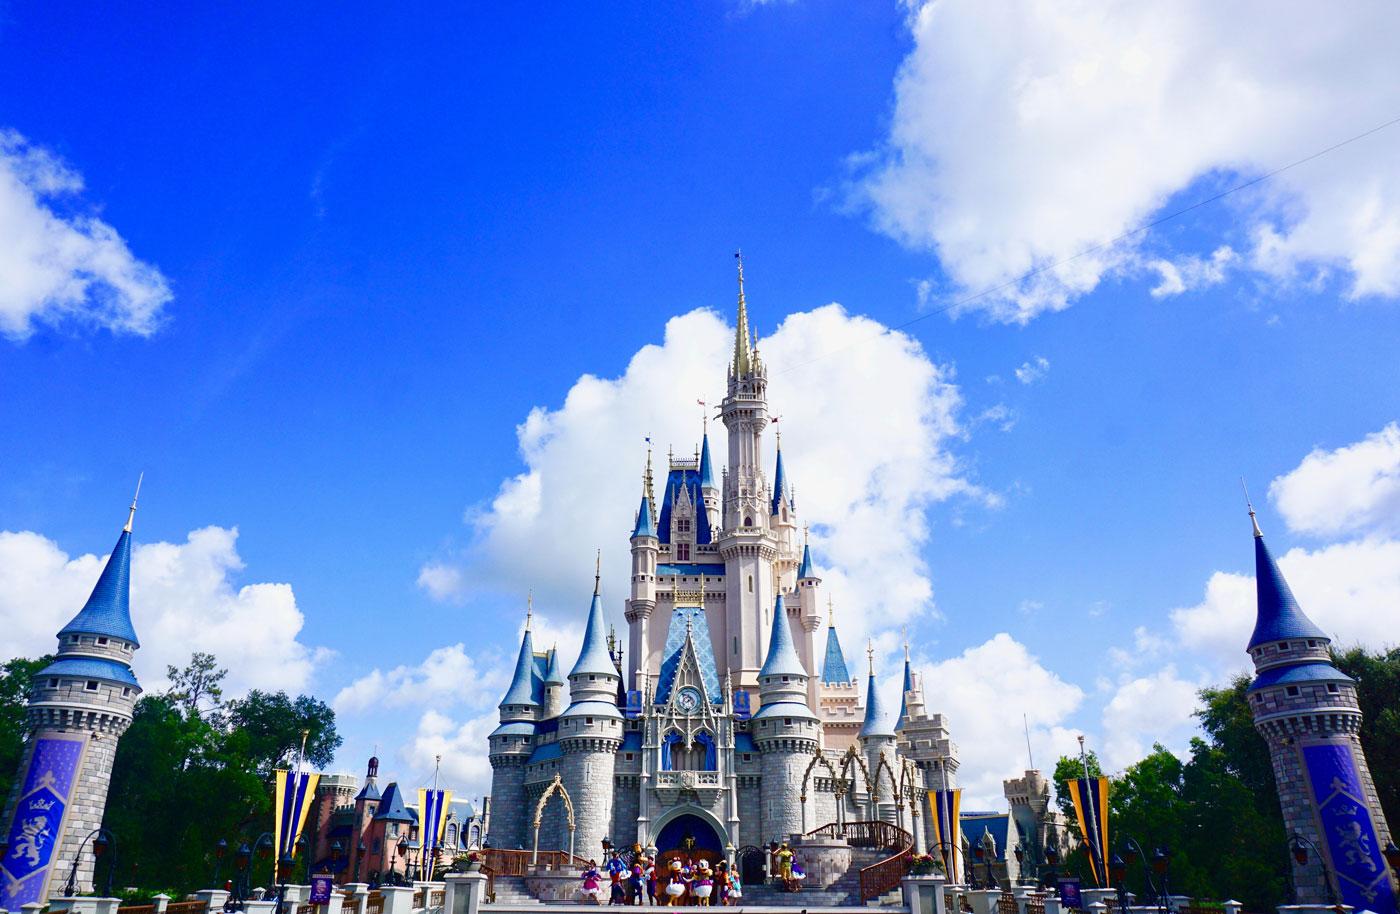 🏰 Disney zapustyv elektronnu versiju svoїh atrakcioniv — teper vidvidaty park možna u sebe vdoma